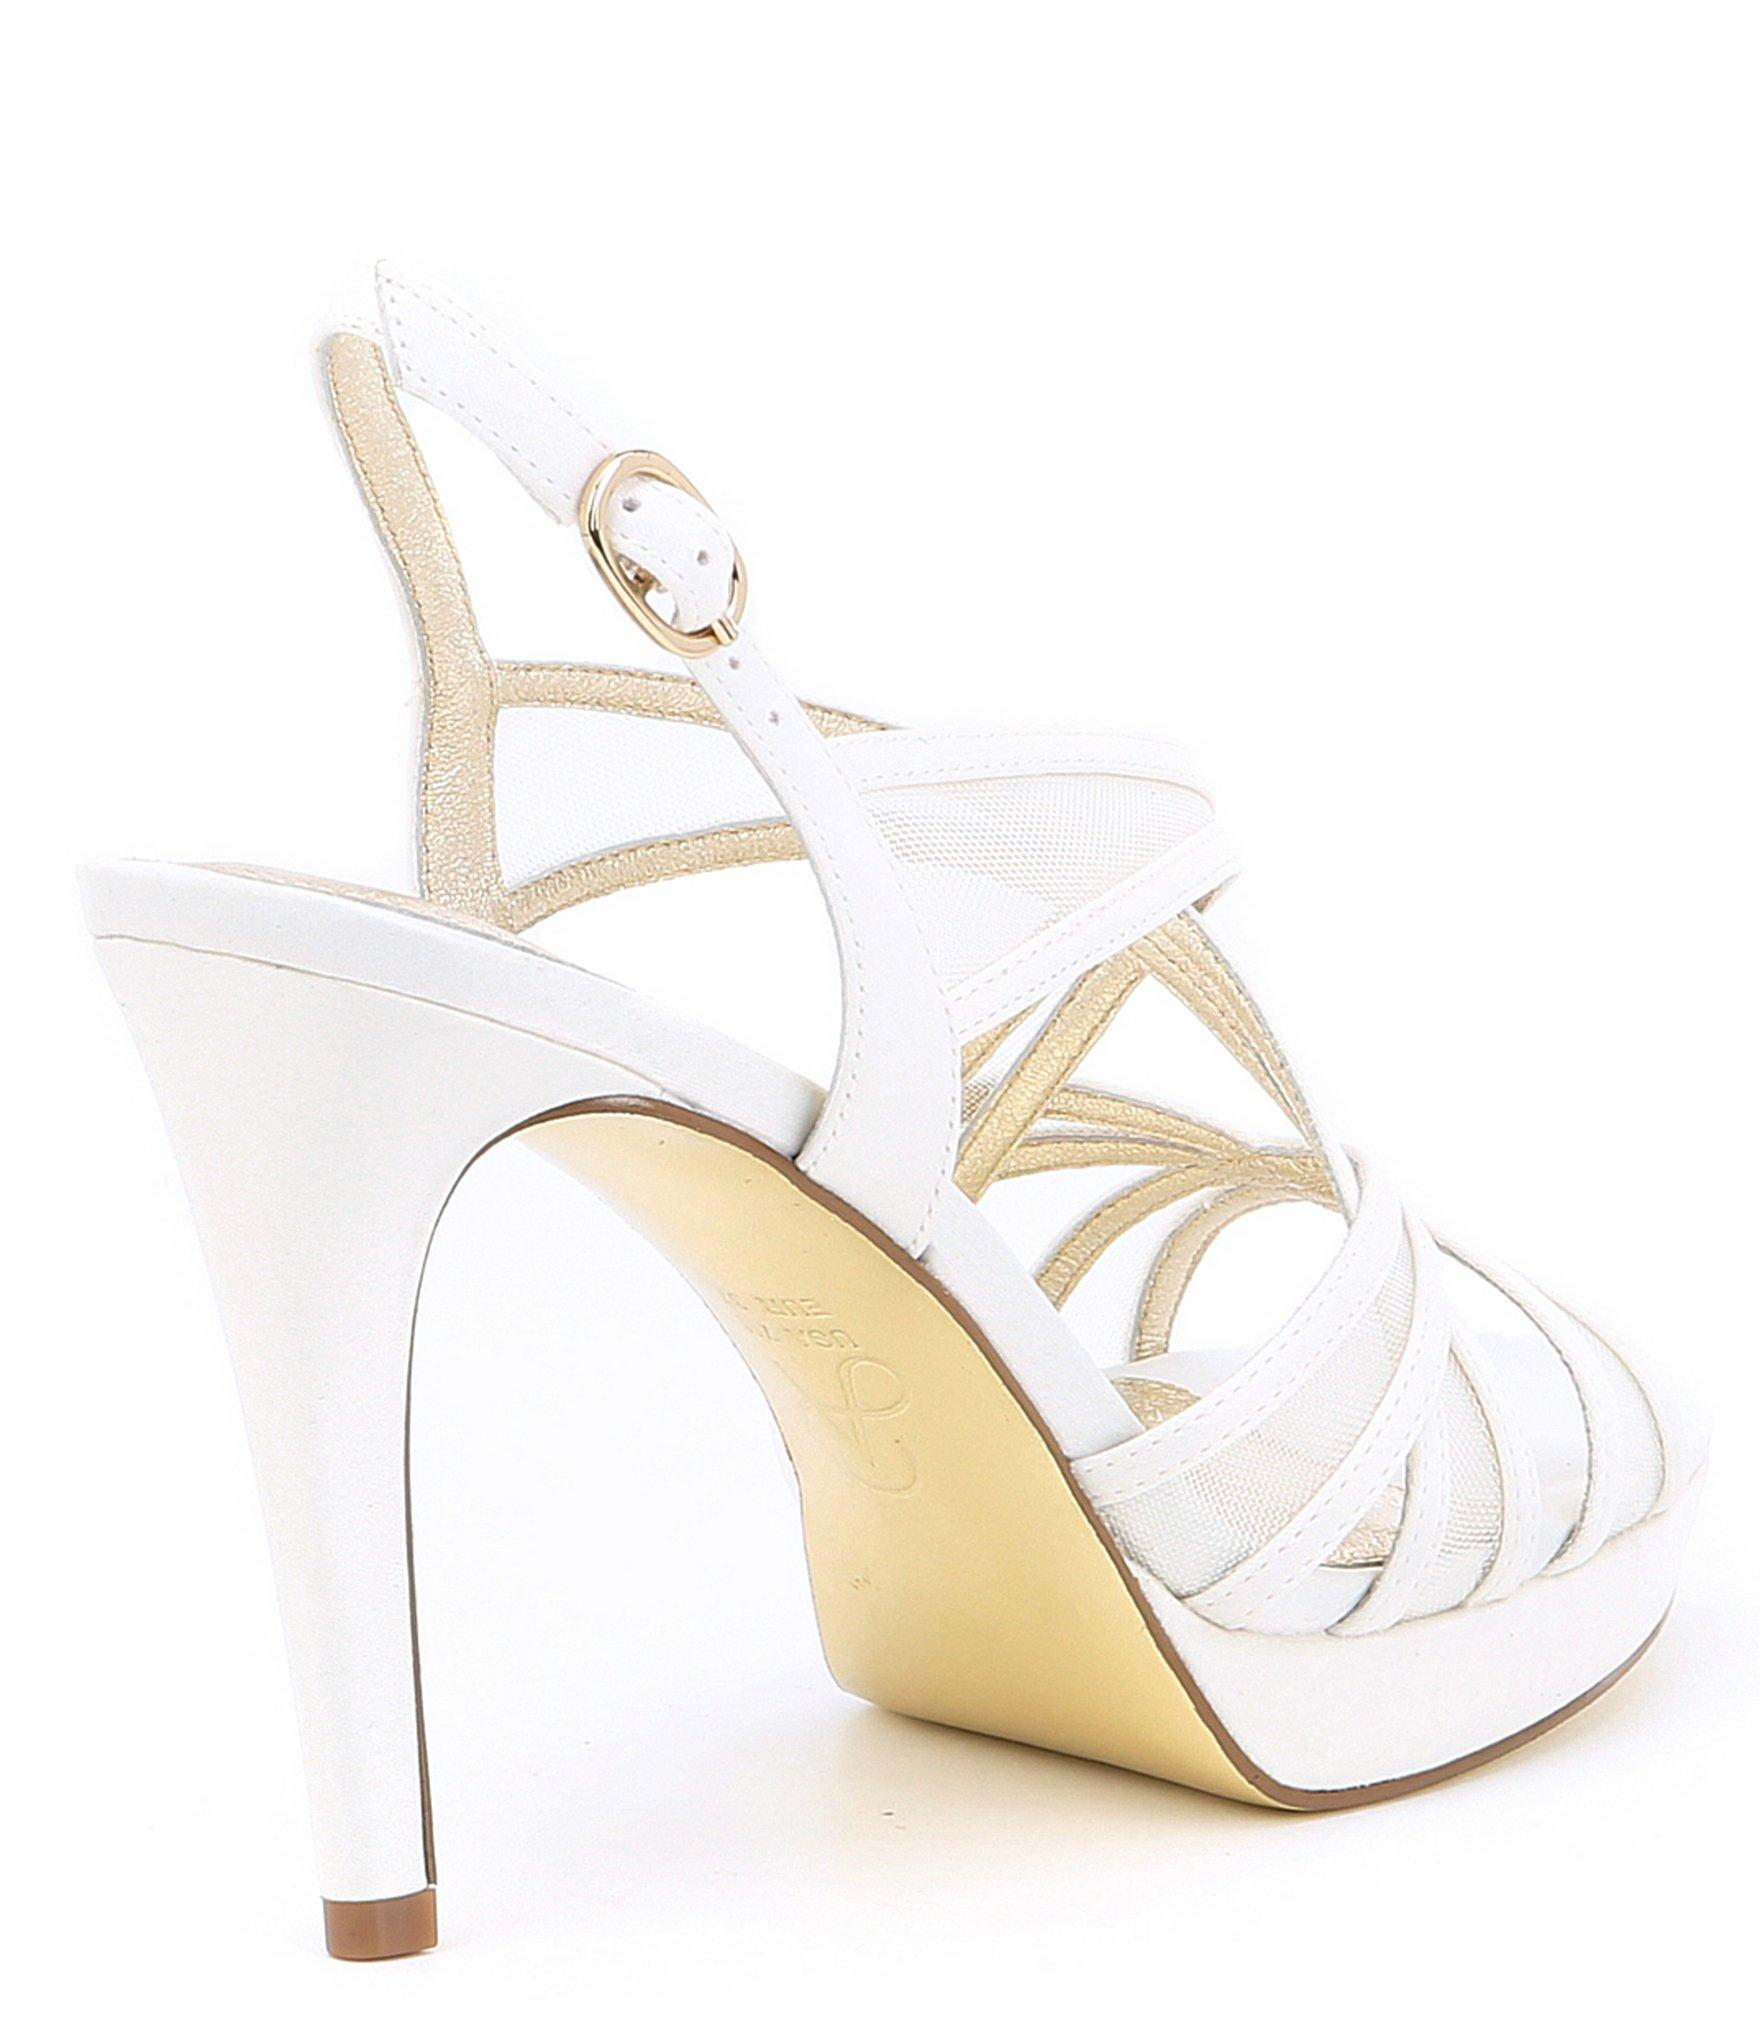 333e06e5f0f Adrianna Papell - White Adri Satin And Mesh Strappy Dress Sandals - Lyst.  View fullscreen